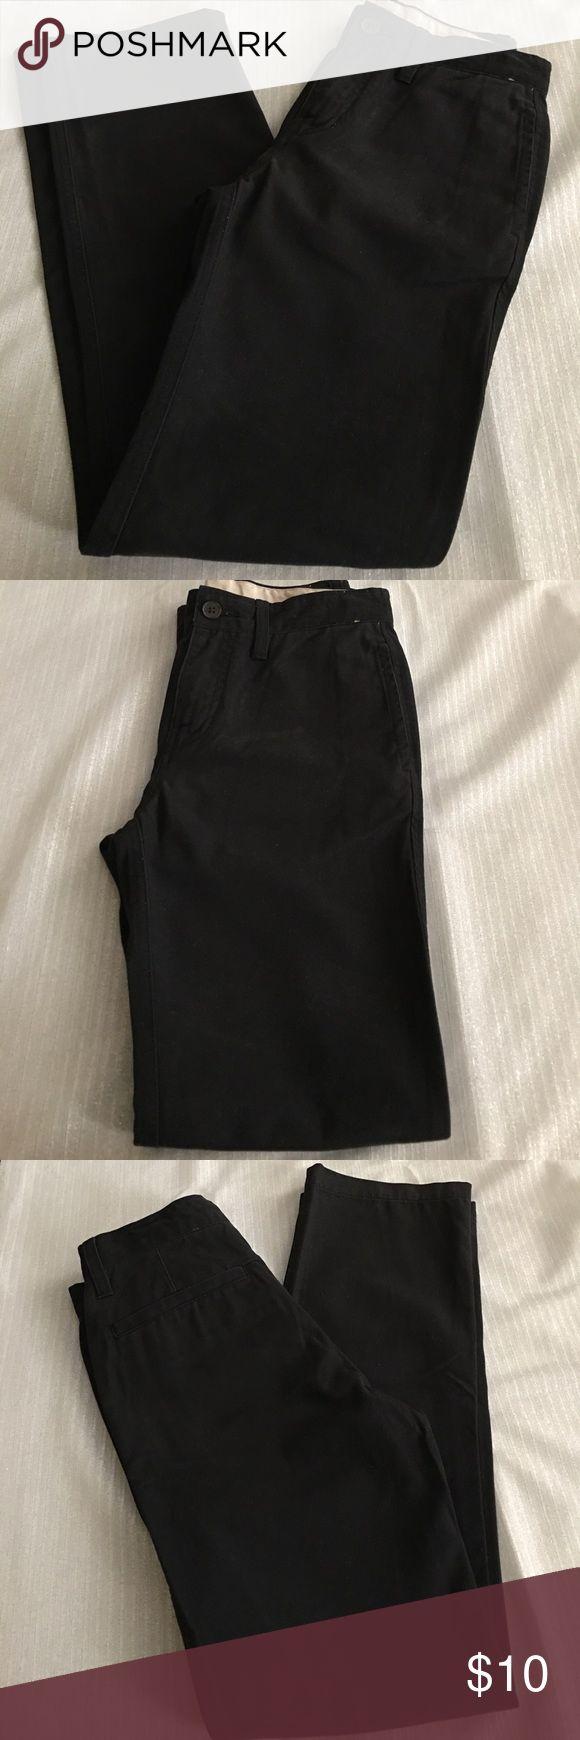 GapKids Size 14 regular black Khaki Slacks GapKids Size 14 regular black Khaki Slacks never worn.... GapKids Bottoms